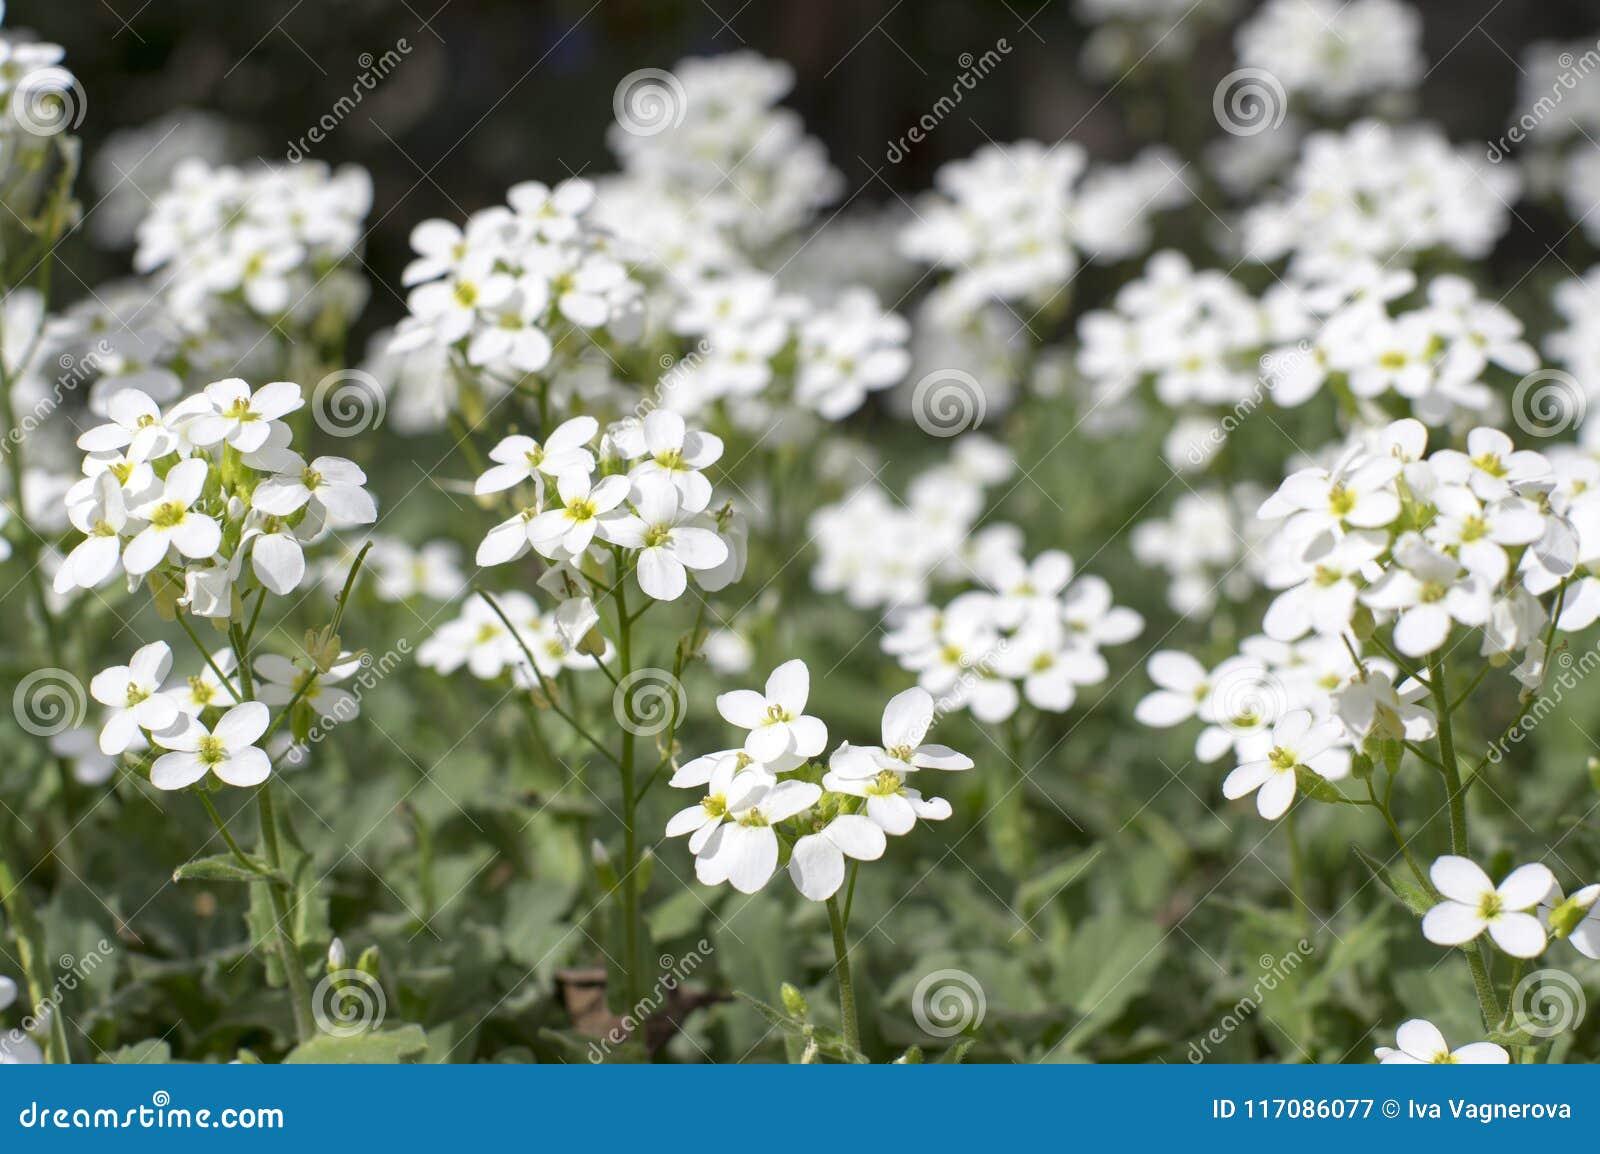 Arabis Caucasica Ornamental Garden White Flowers Mountain Rock